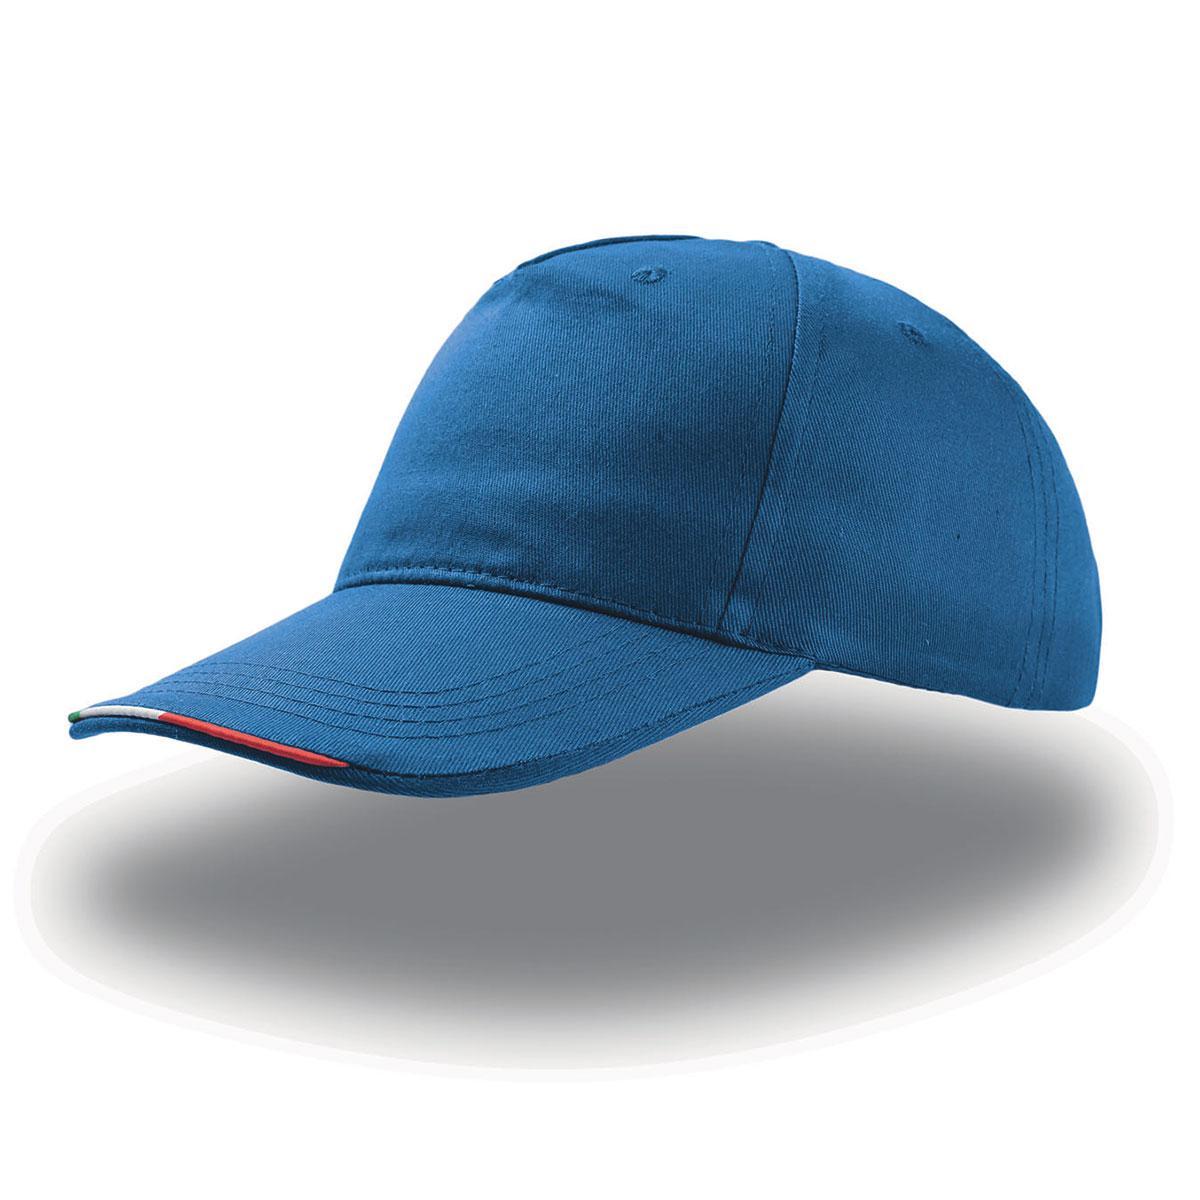 Cappellino con Visiera Bordo Tricolore Atlantis - Vestilogo 6ba5593f1788